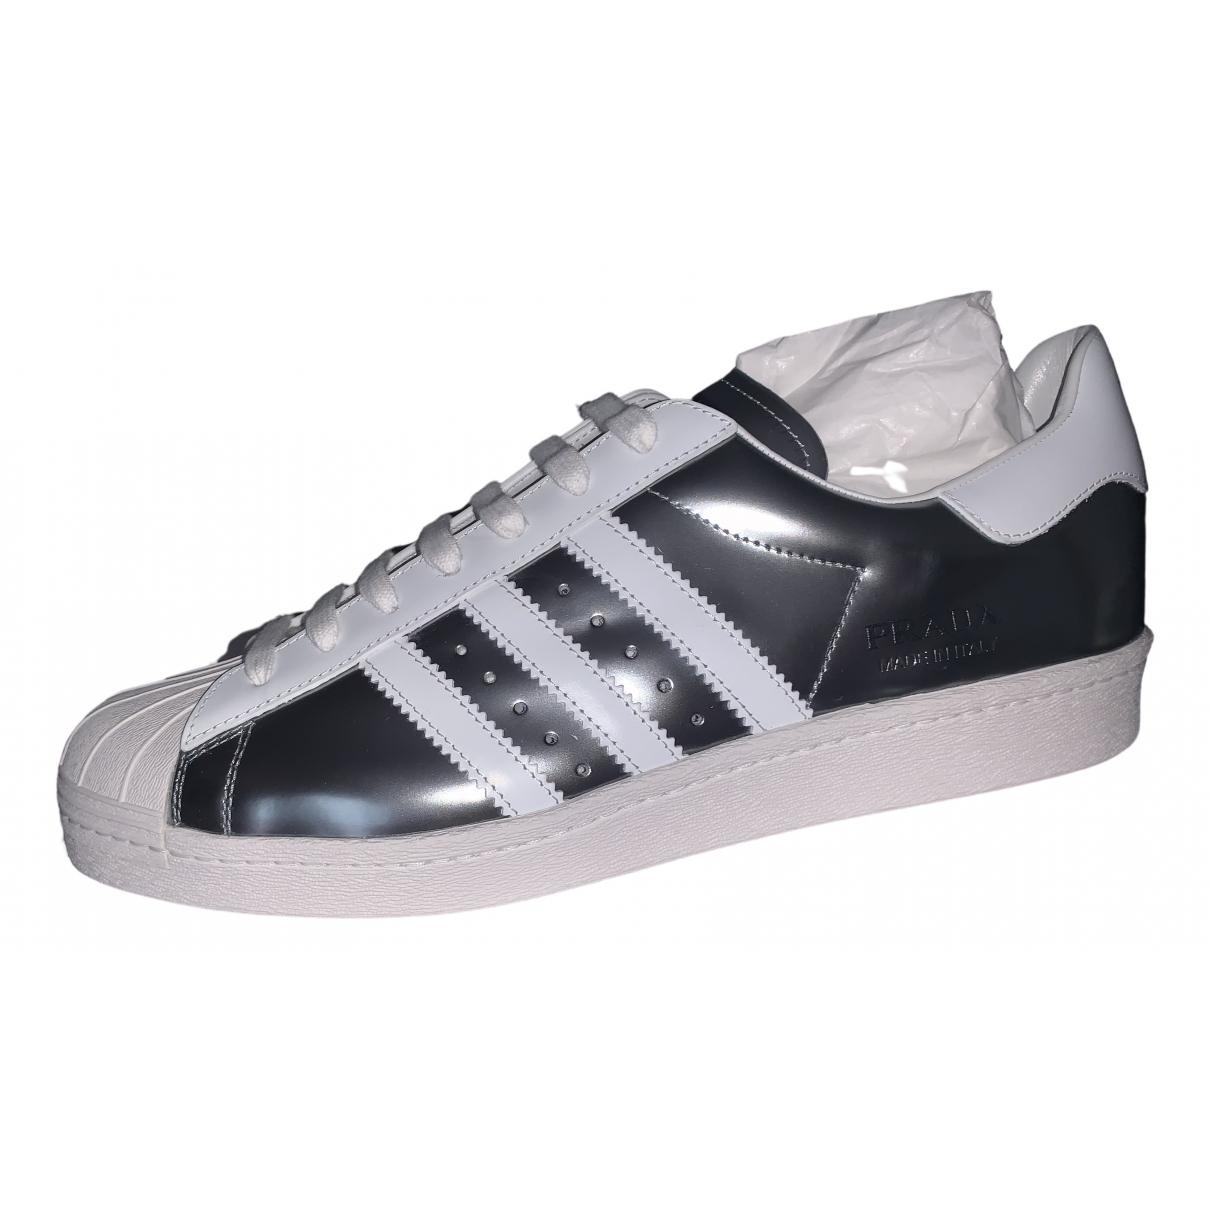 Prada X Adidas \N Metallic Patent leather Trainers for Men 45 EU